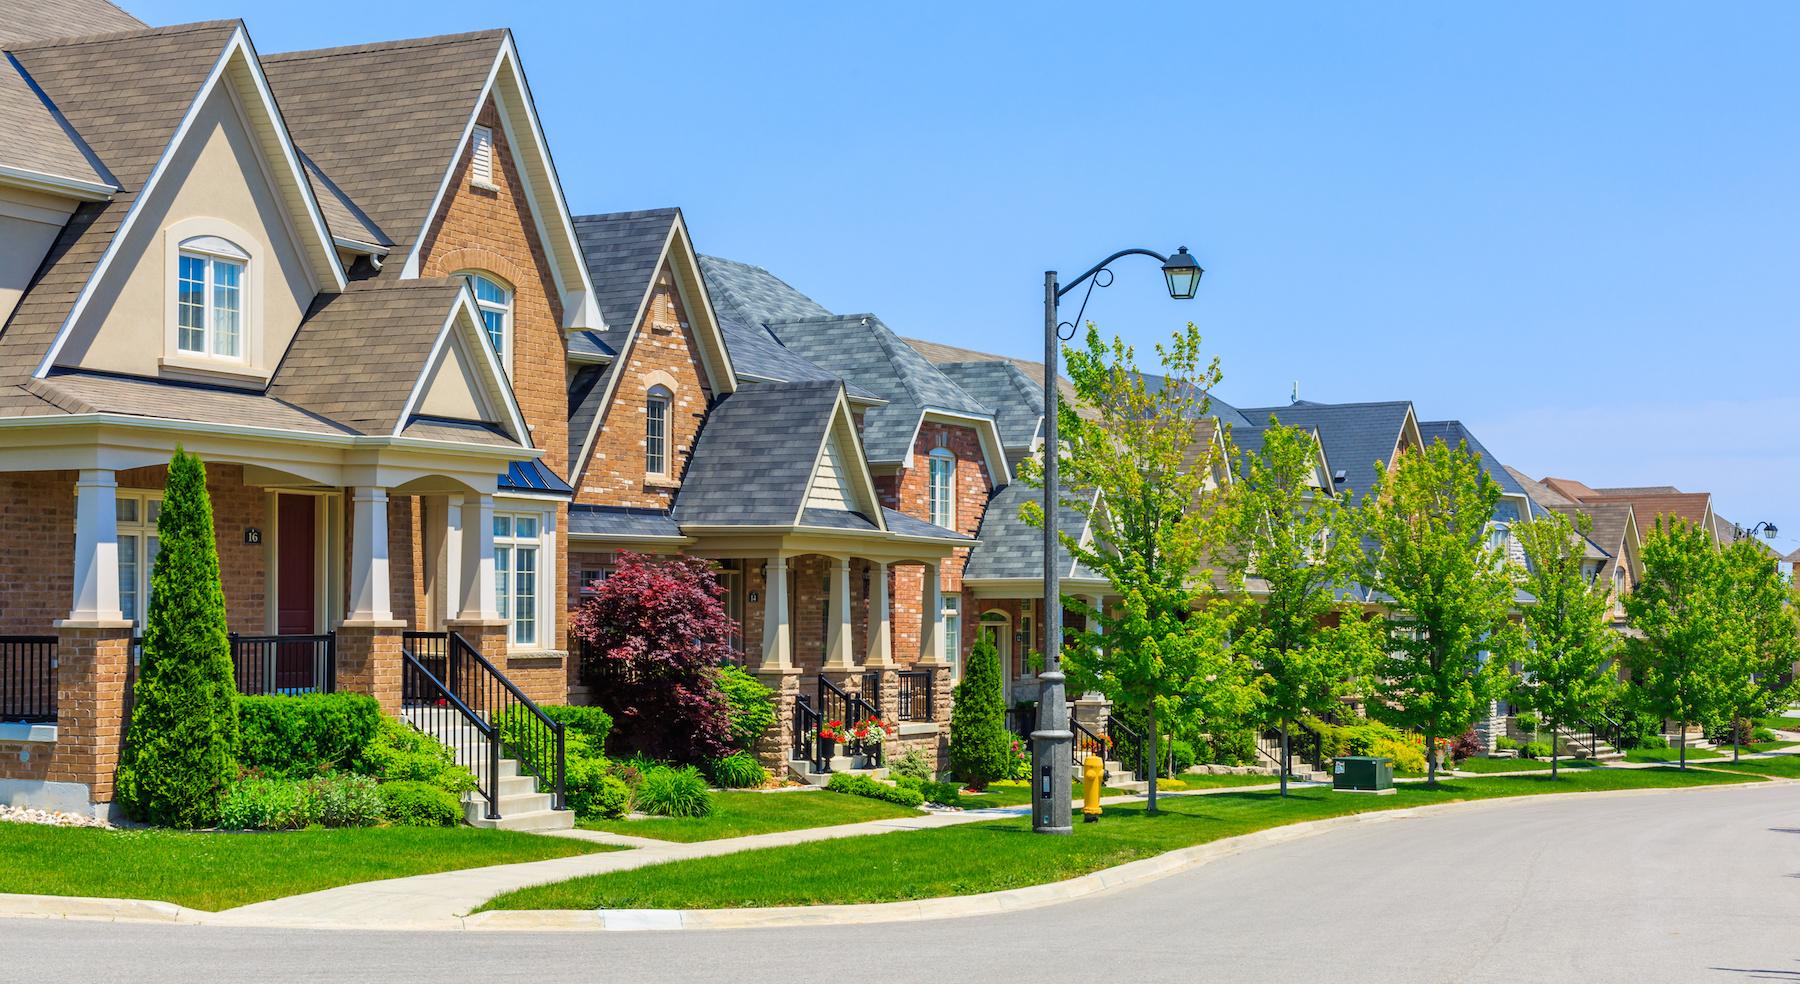 oakville millcroft homeowners home buyers homes for sale sarah logue team logue real estate burlington